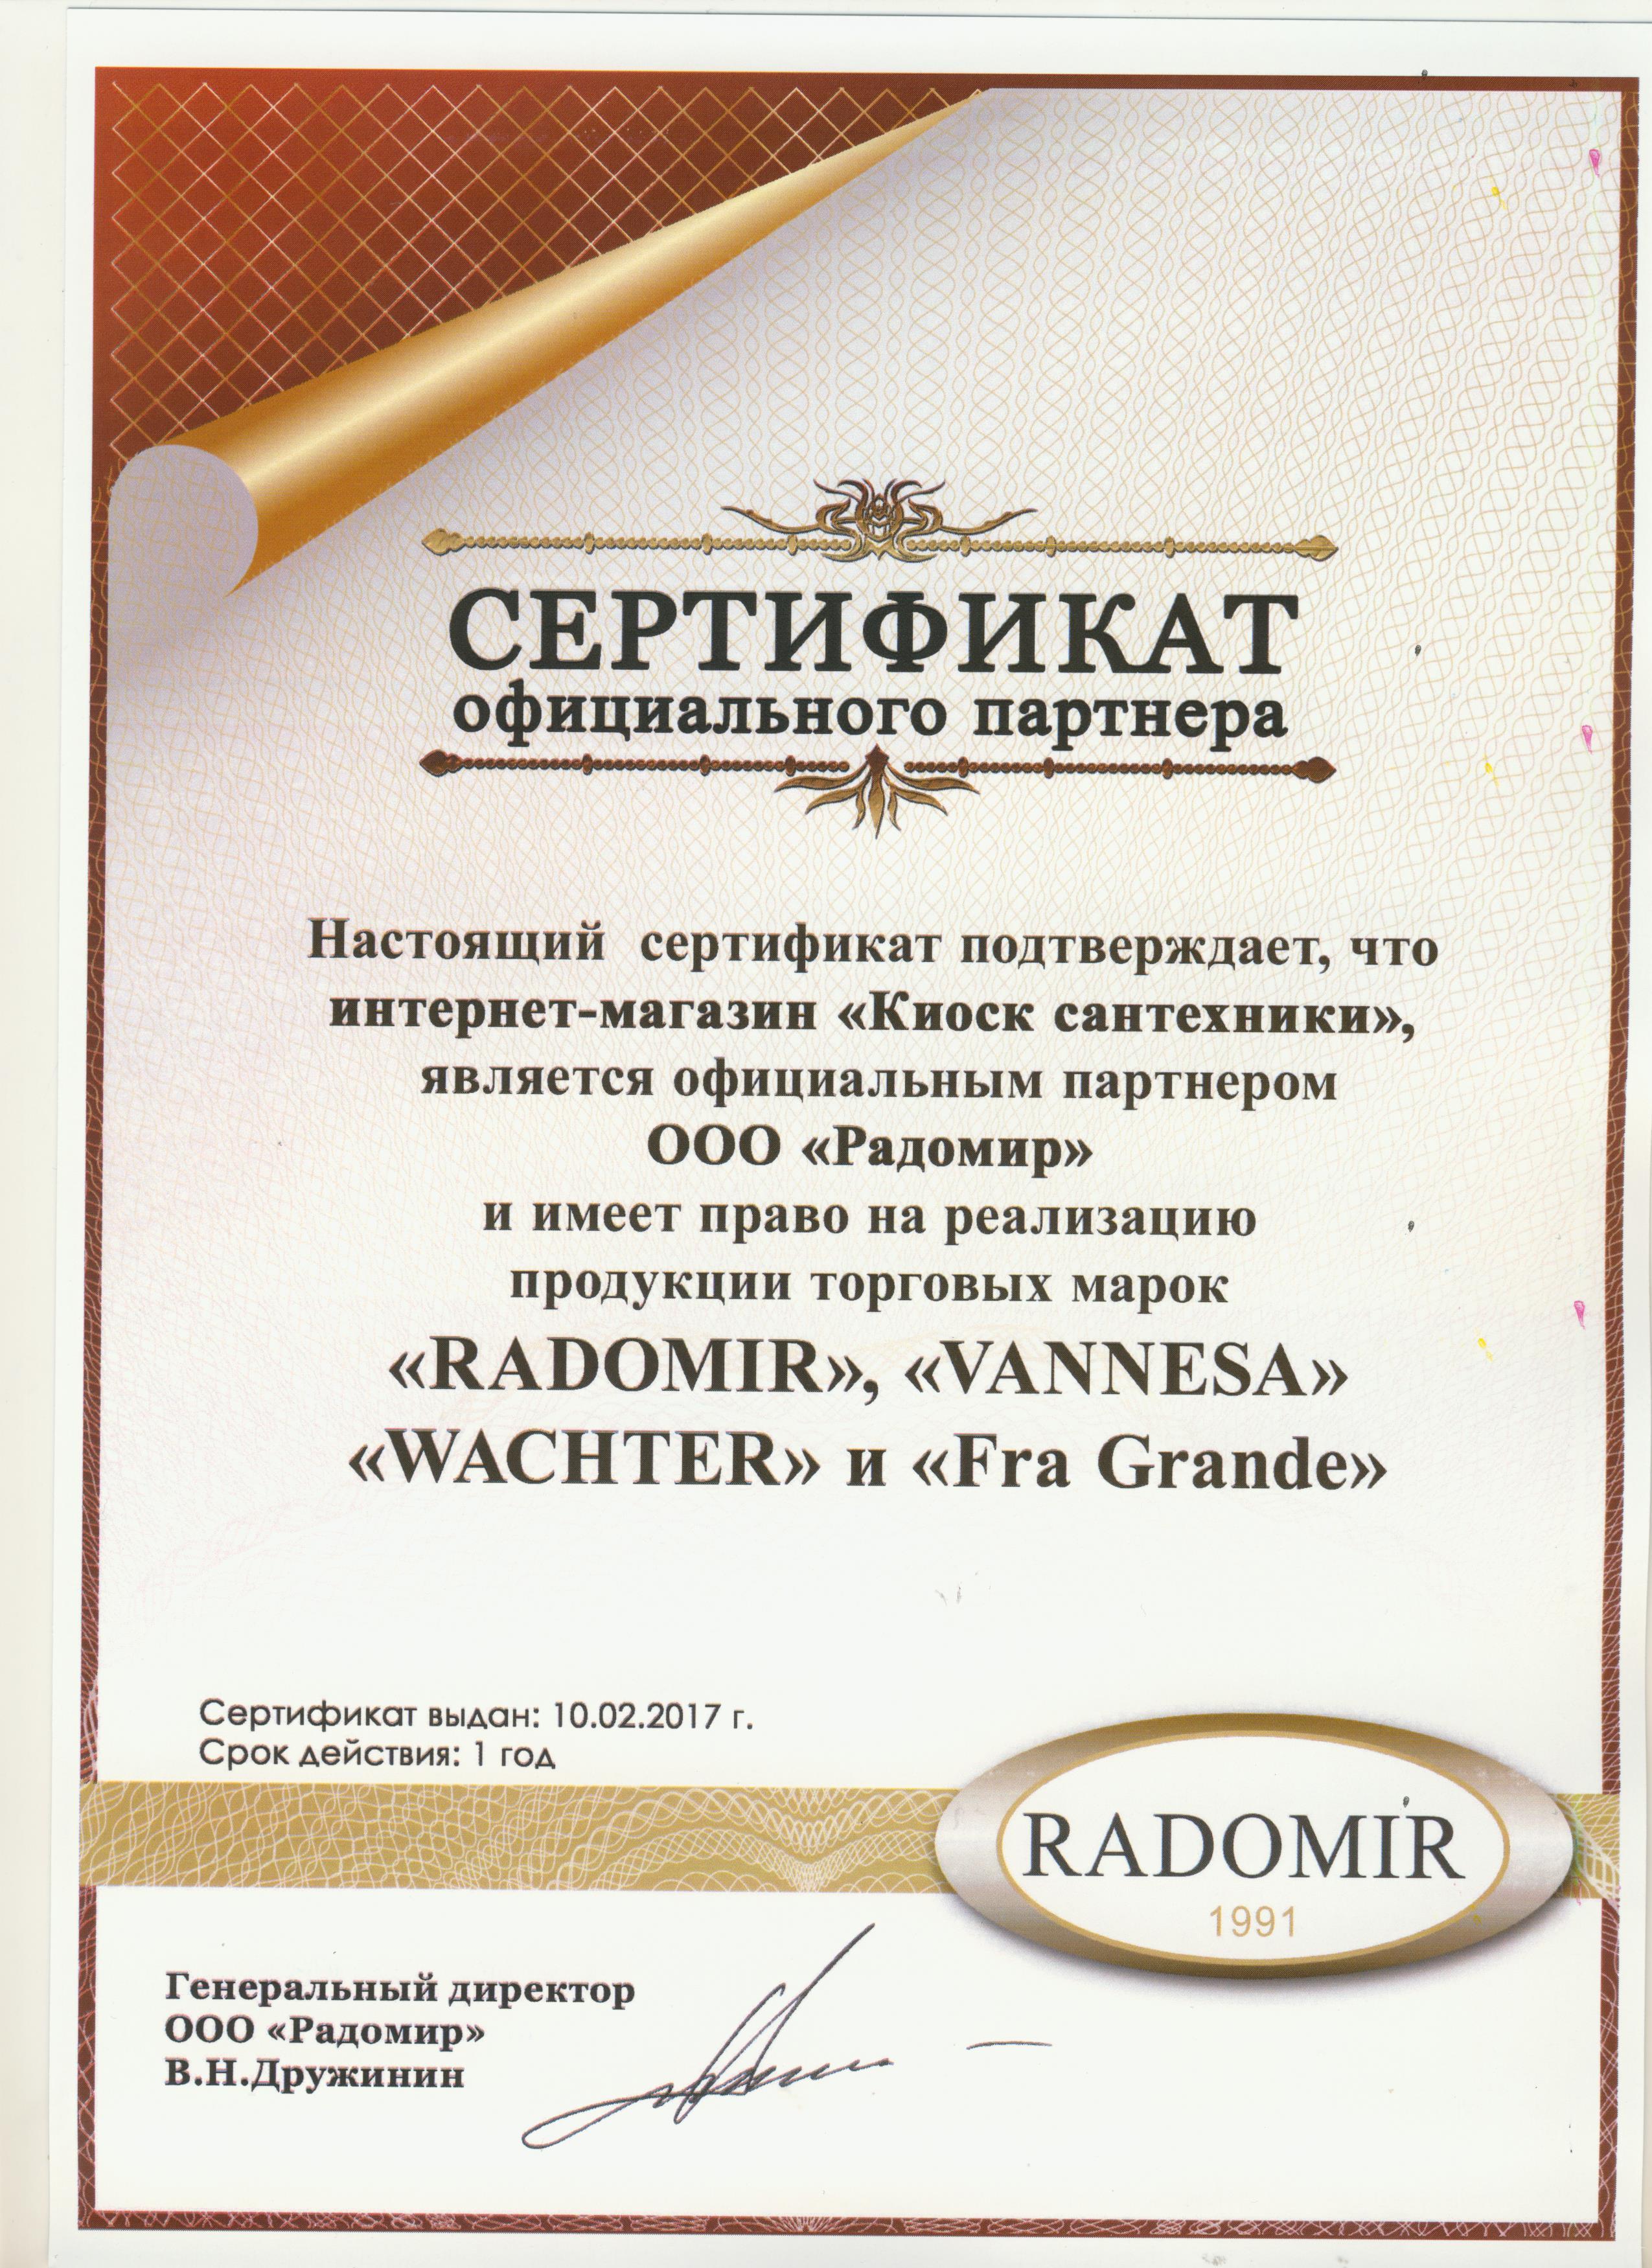 Фото 334: Гидромассажная ванна Радомир (Radomir) ВАЛЕНСИЯ WHITE серия Сomfort